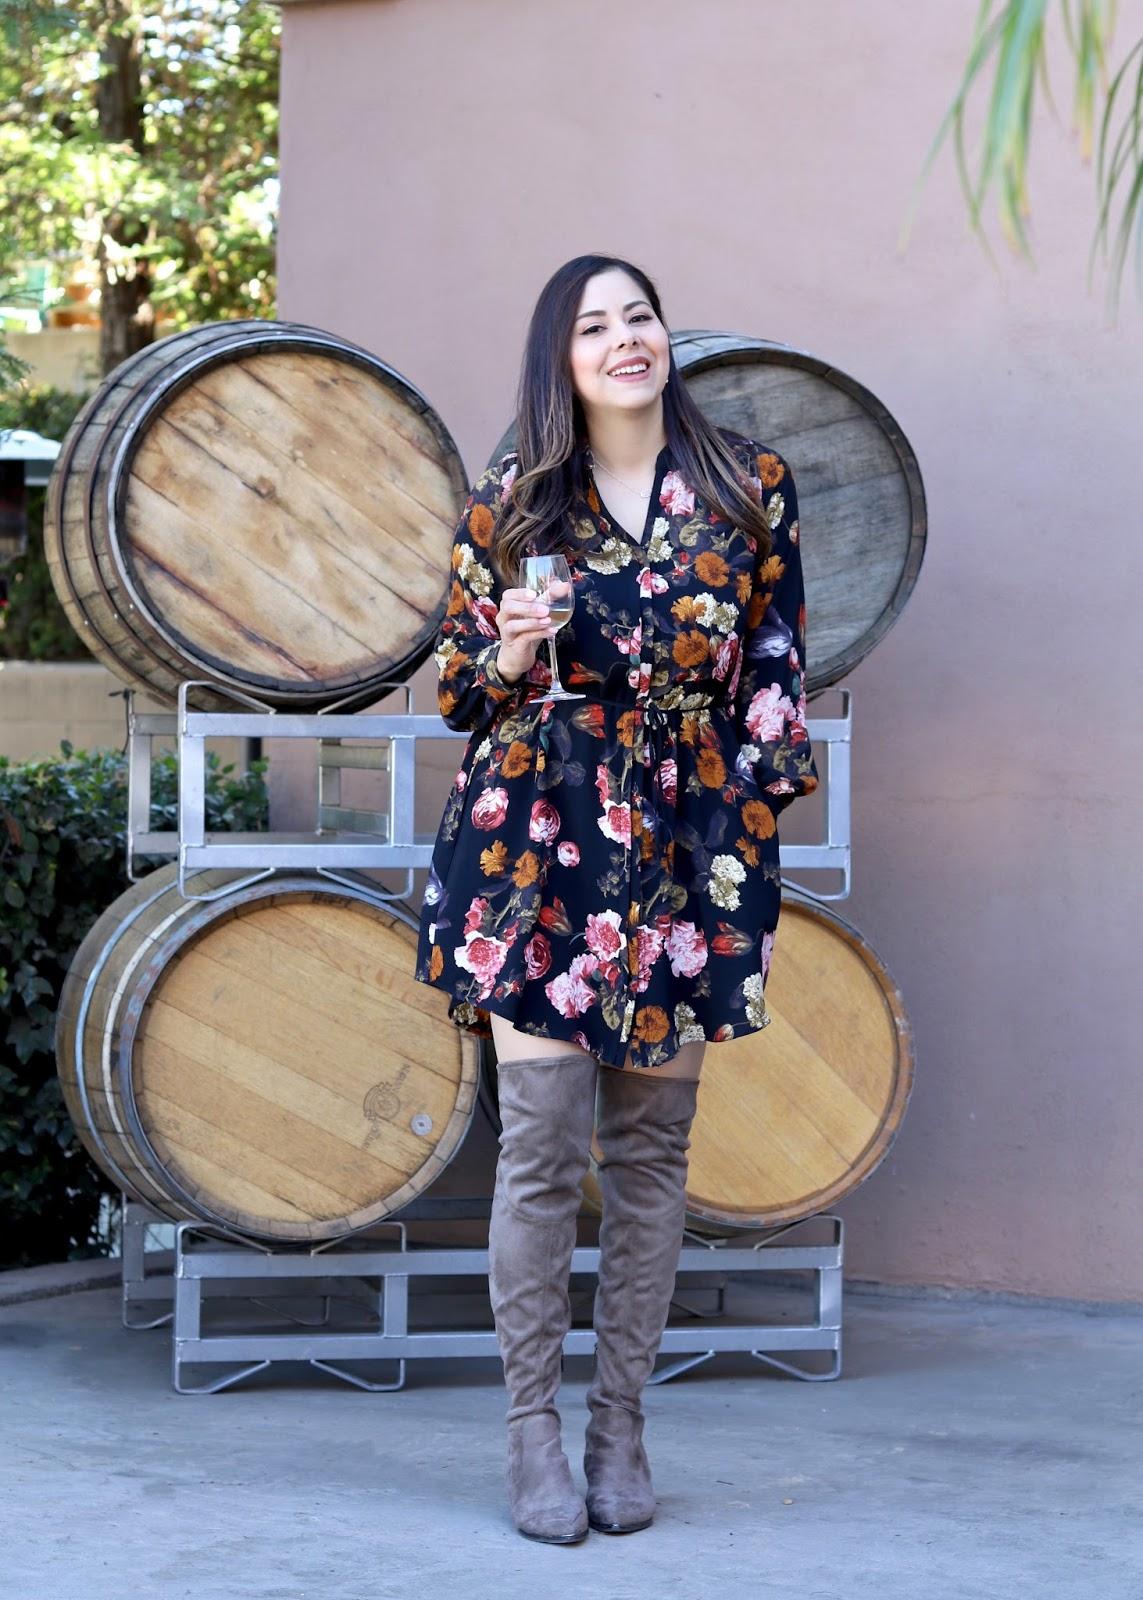 Wine tasting in temecula, wine tasting in temecula outfit, wine tasting outfit